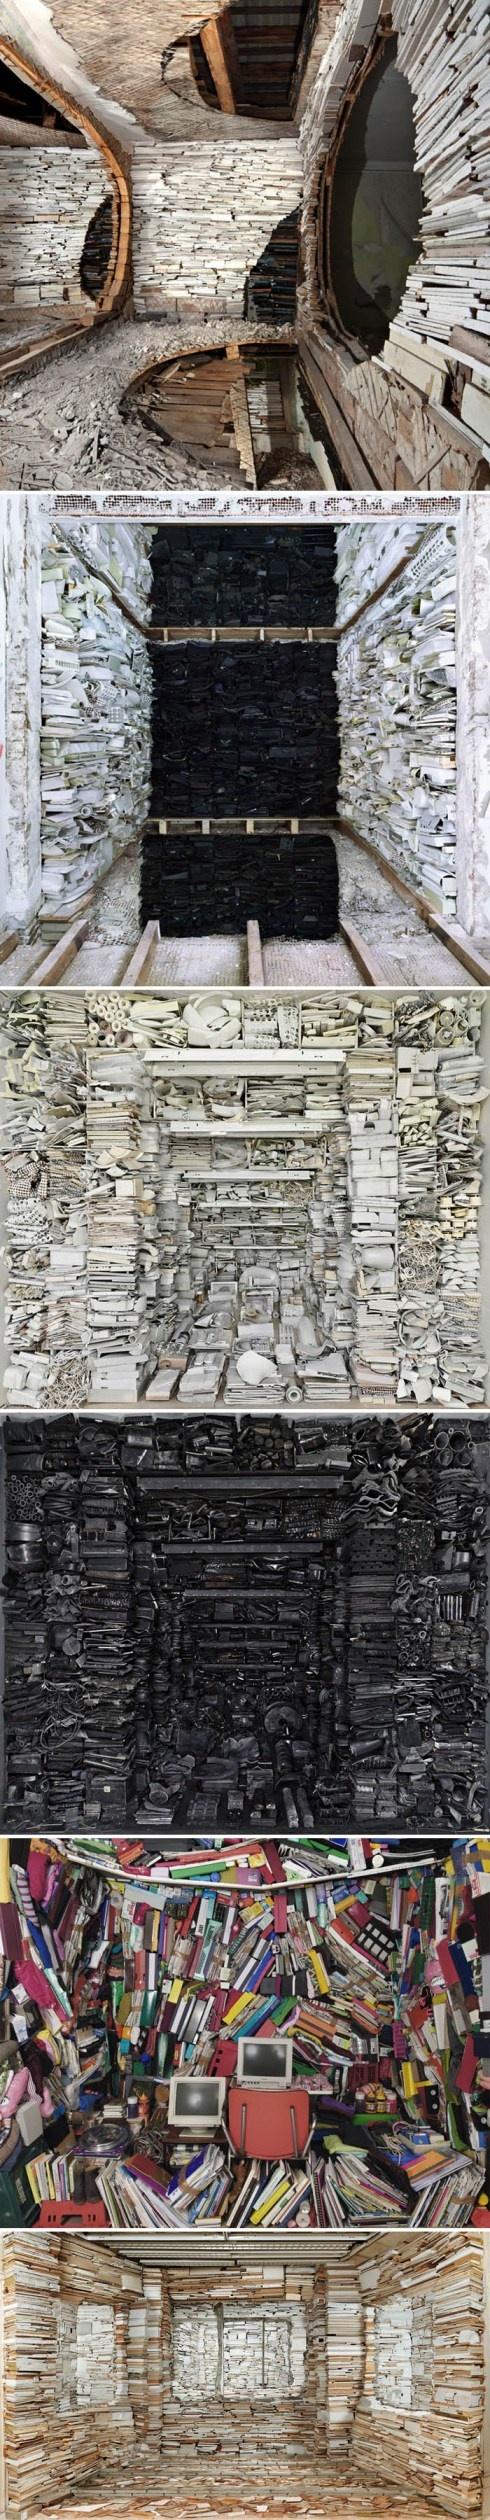 Marjan Teeuwen: Crammed Spaces